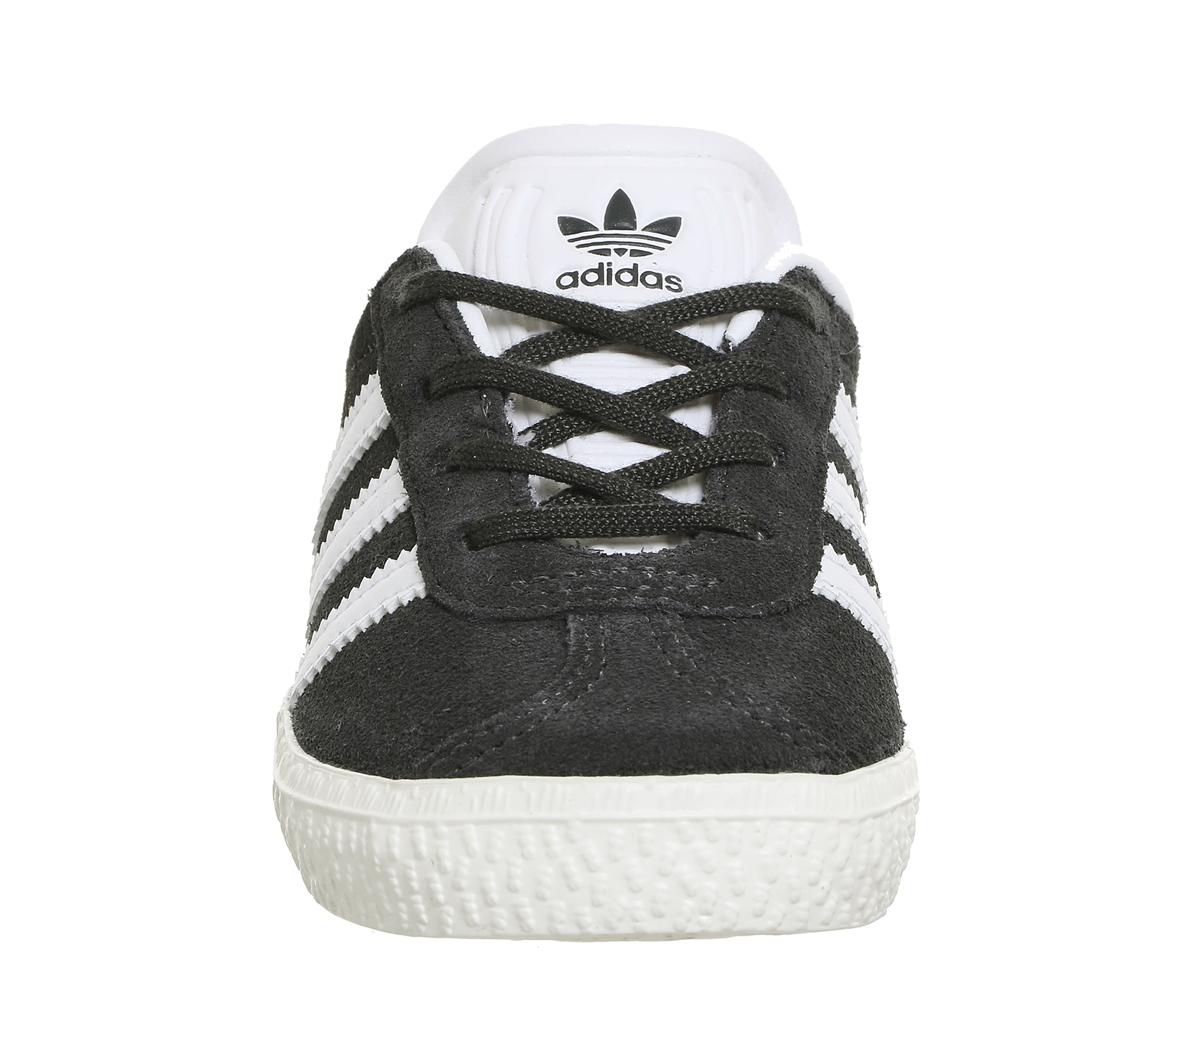 298c8d46436d4 Kids Adidas Gazelle 2 Infant Dark Solid Grey White Kids